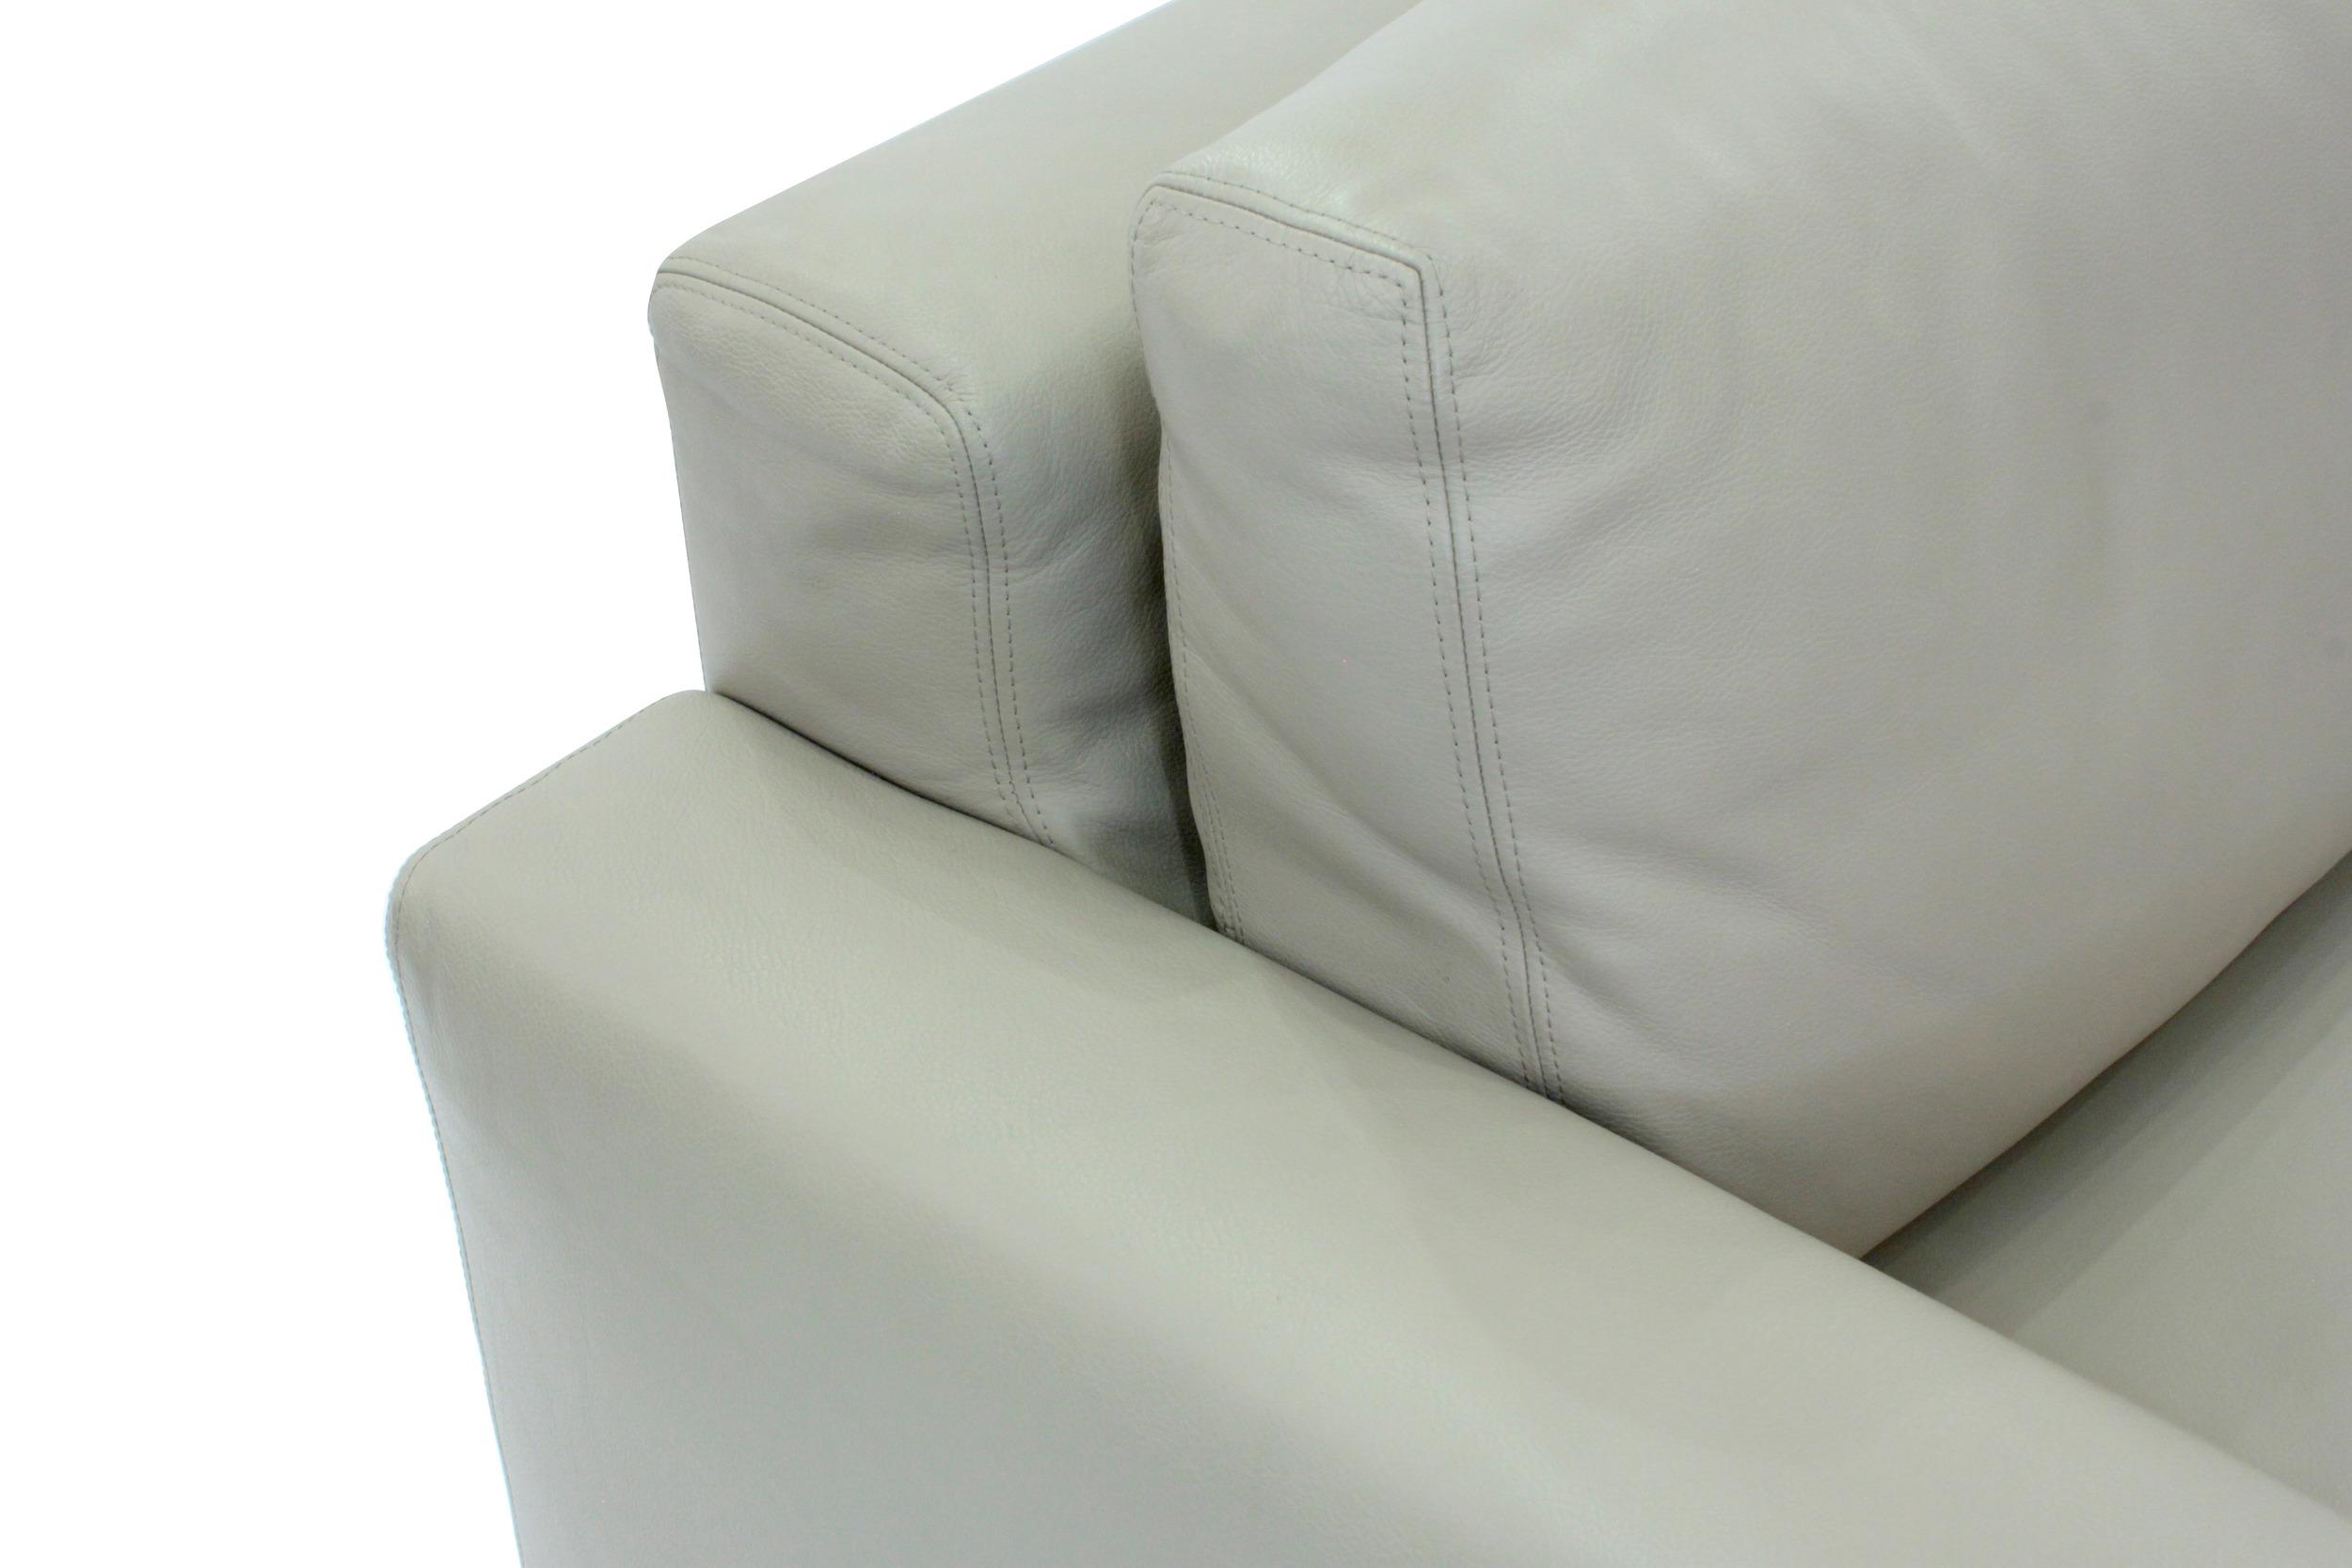 Minotti 65 cleanline lthr clubchairs54 detail5 hires.JPG